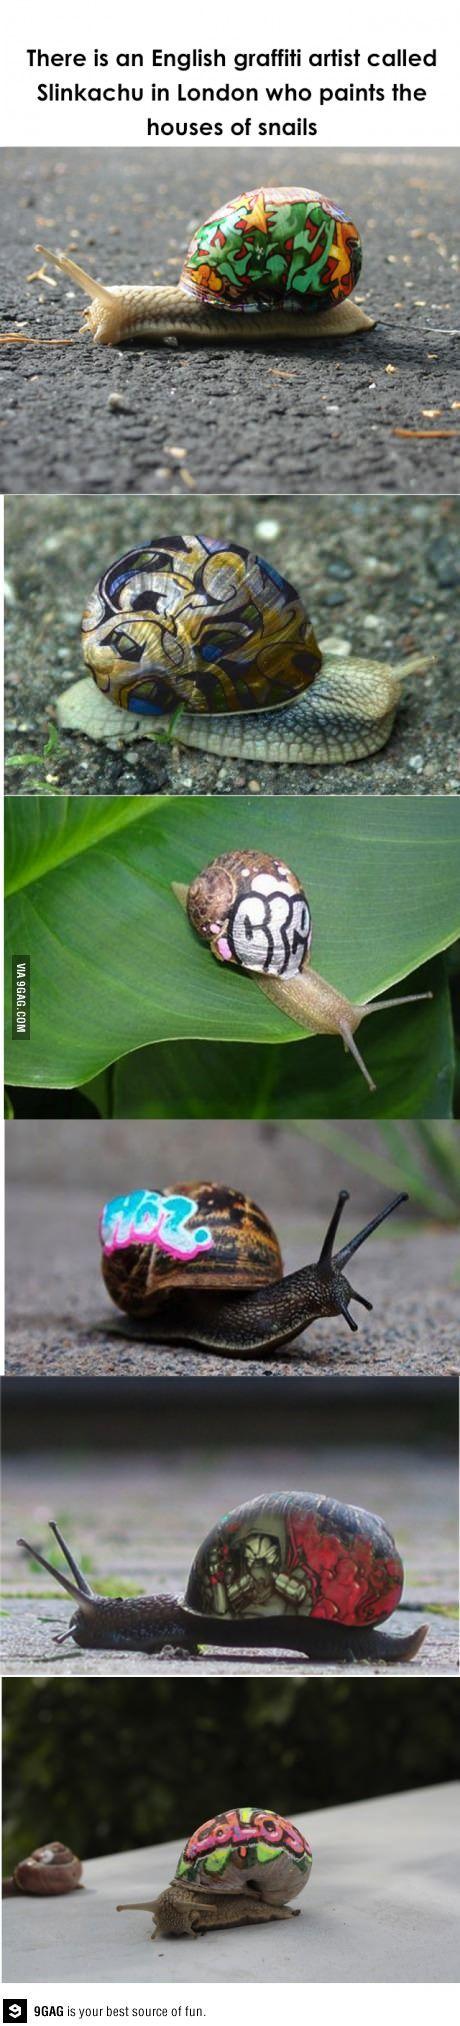 Snail Paint #crazycoolthings #streetart #art #graffiti